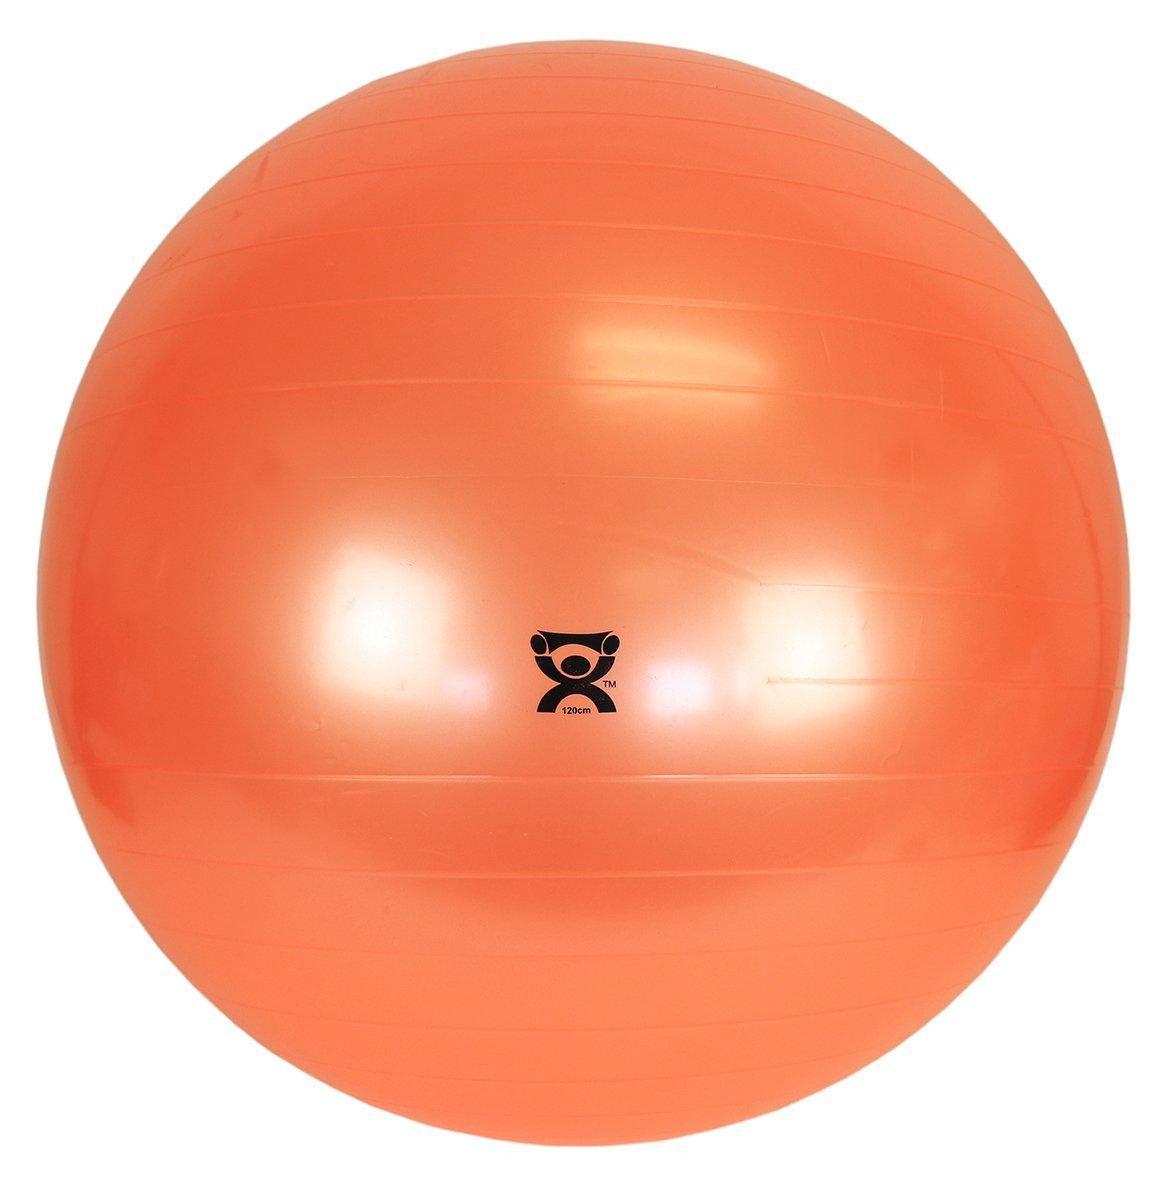 CanDo Non-Slip Vinyl Inflatable Exercise Ball, Orange, 47.3''